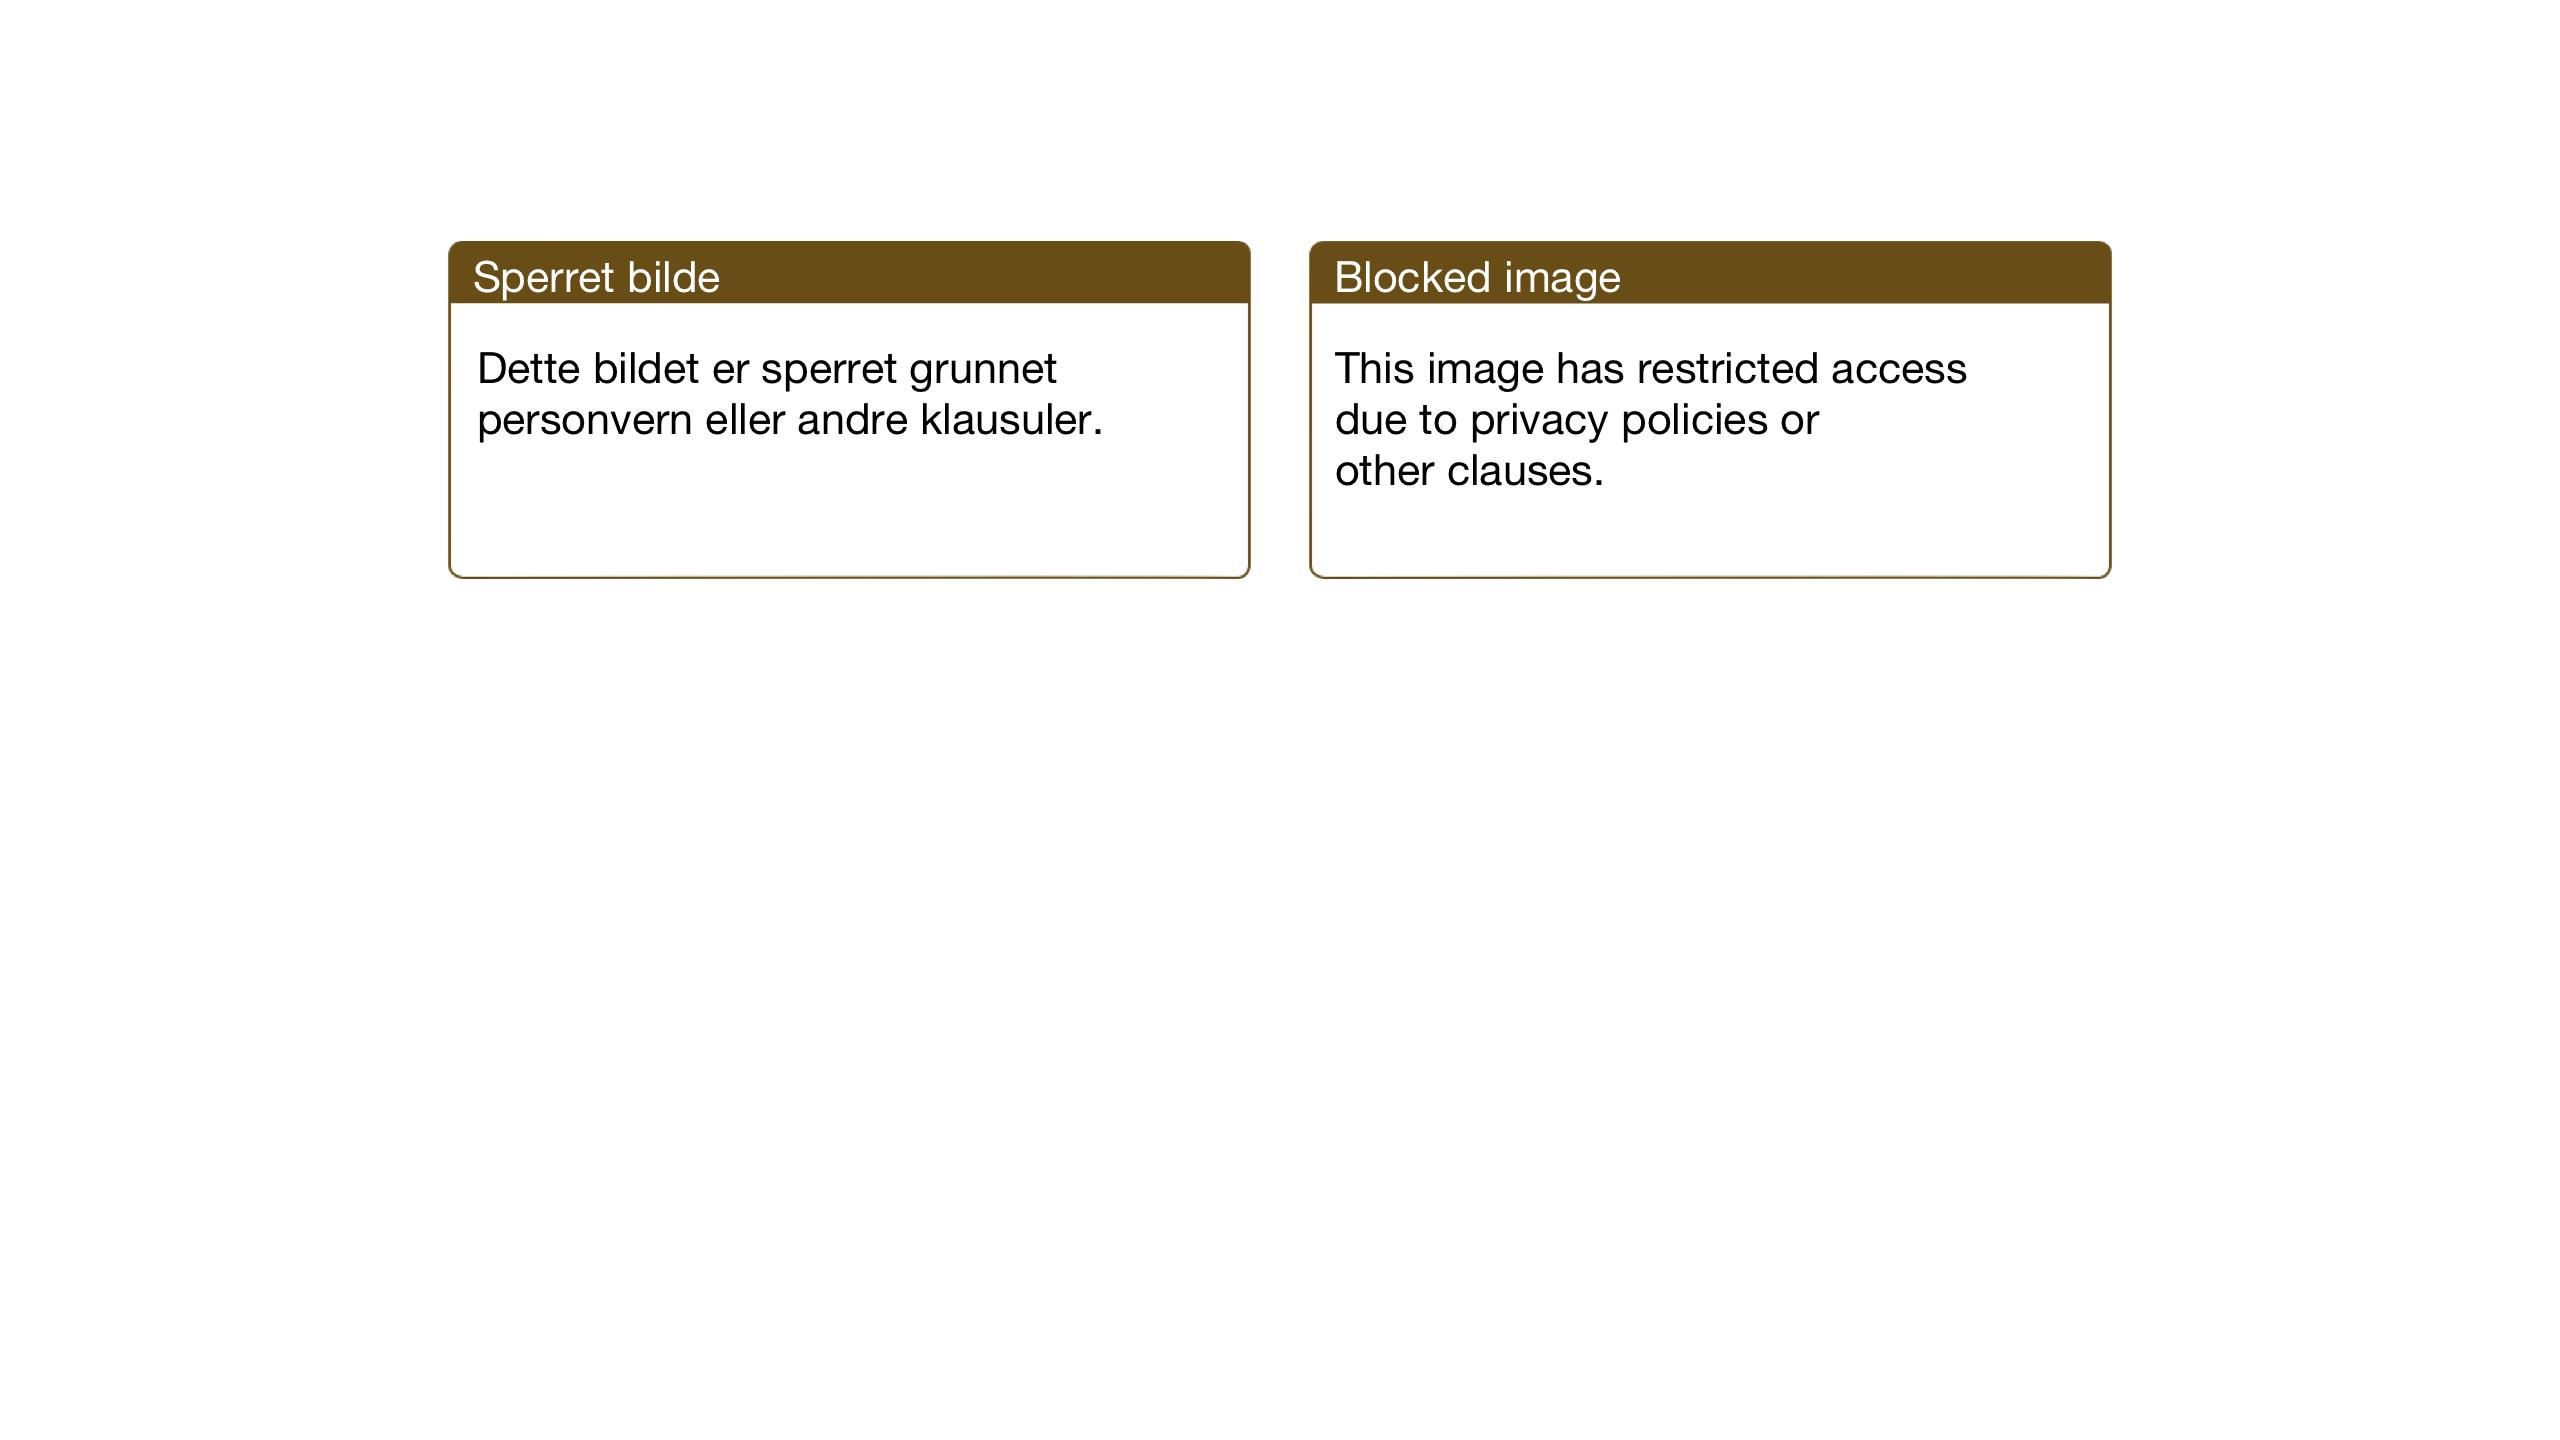 SAB, Domkirken sokneprestembete, H/Haa: Ministerialbok nr. E 1, 2002-2011, s. 5b-6a